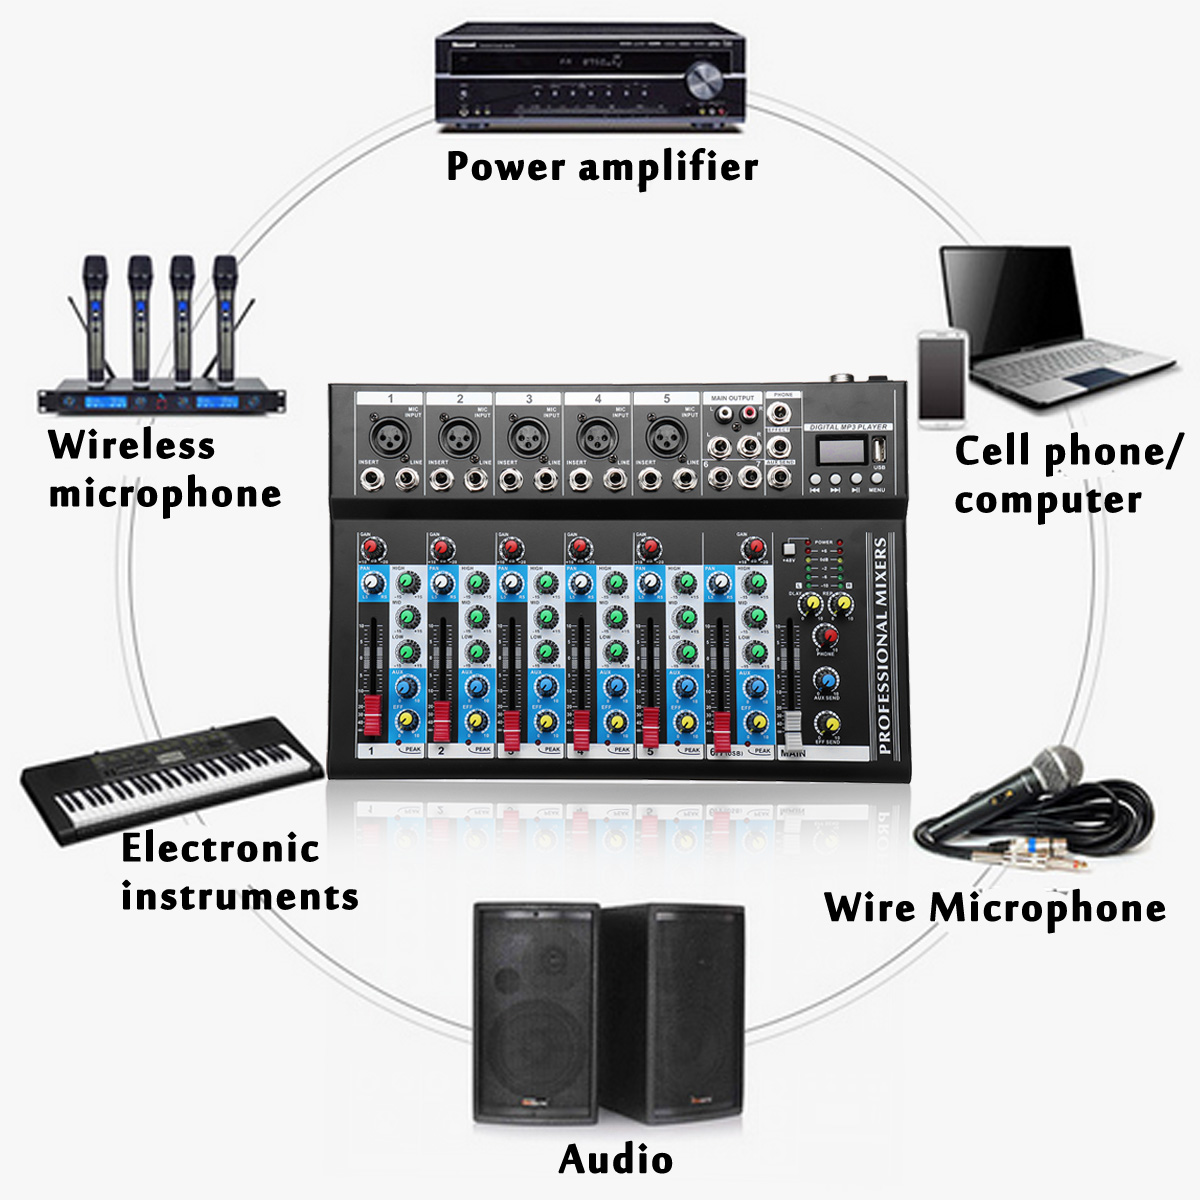 7 kanal Karaoke Mixer USB Digital bluetooth Live Studio Audio Mischen Konsole Mikrofon Soundkarte für DJ Hochzeit Party KTV